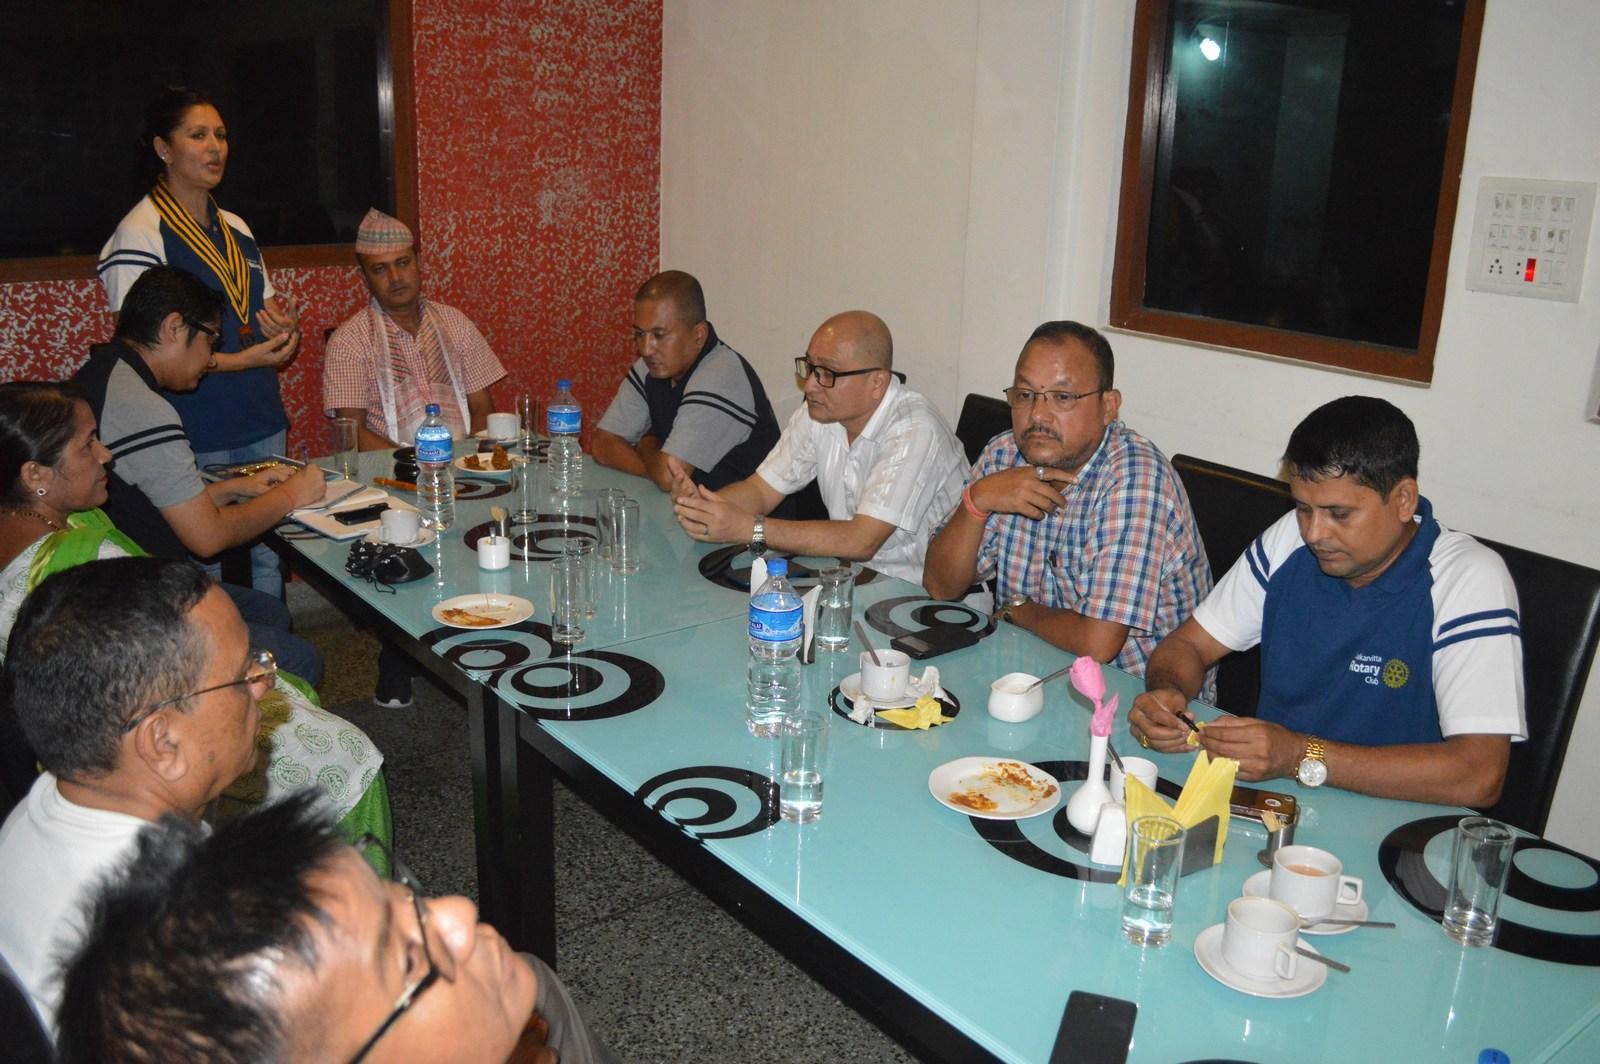 Weekly-Meeting-with-the-Guest-Speaker-DSP-Durga-Raj-Regmi-Rotary-Club-of-Kakarvitta-15